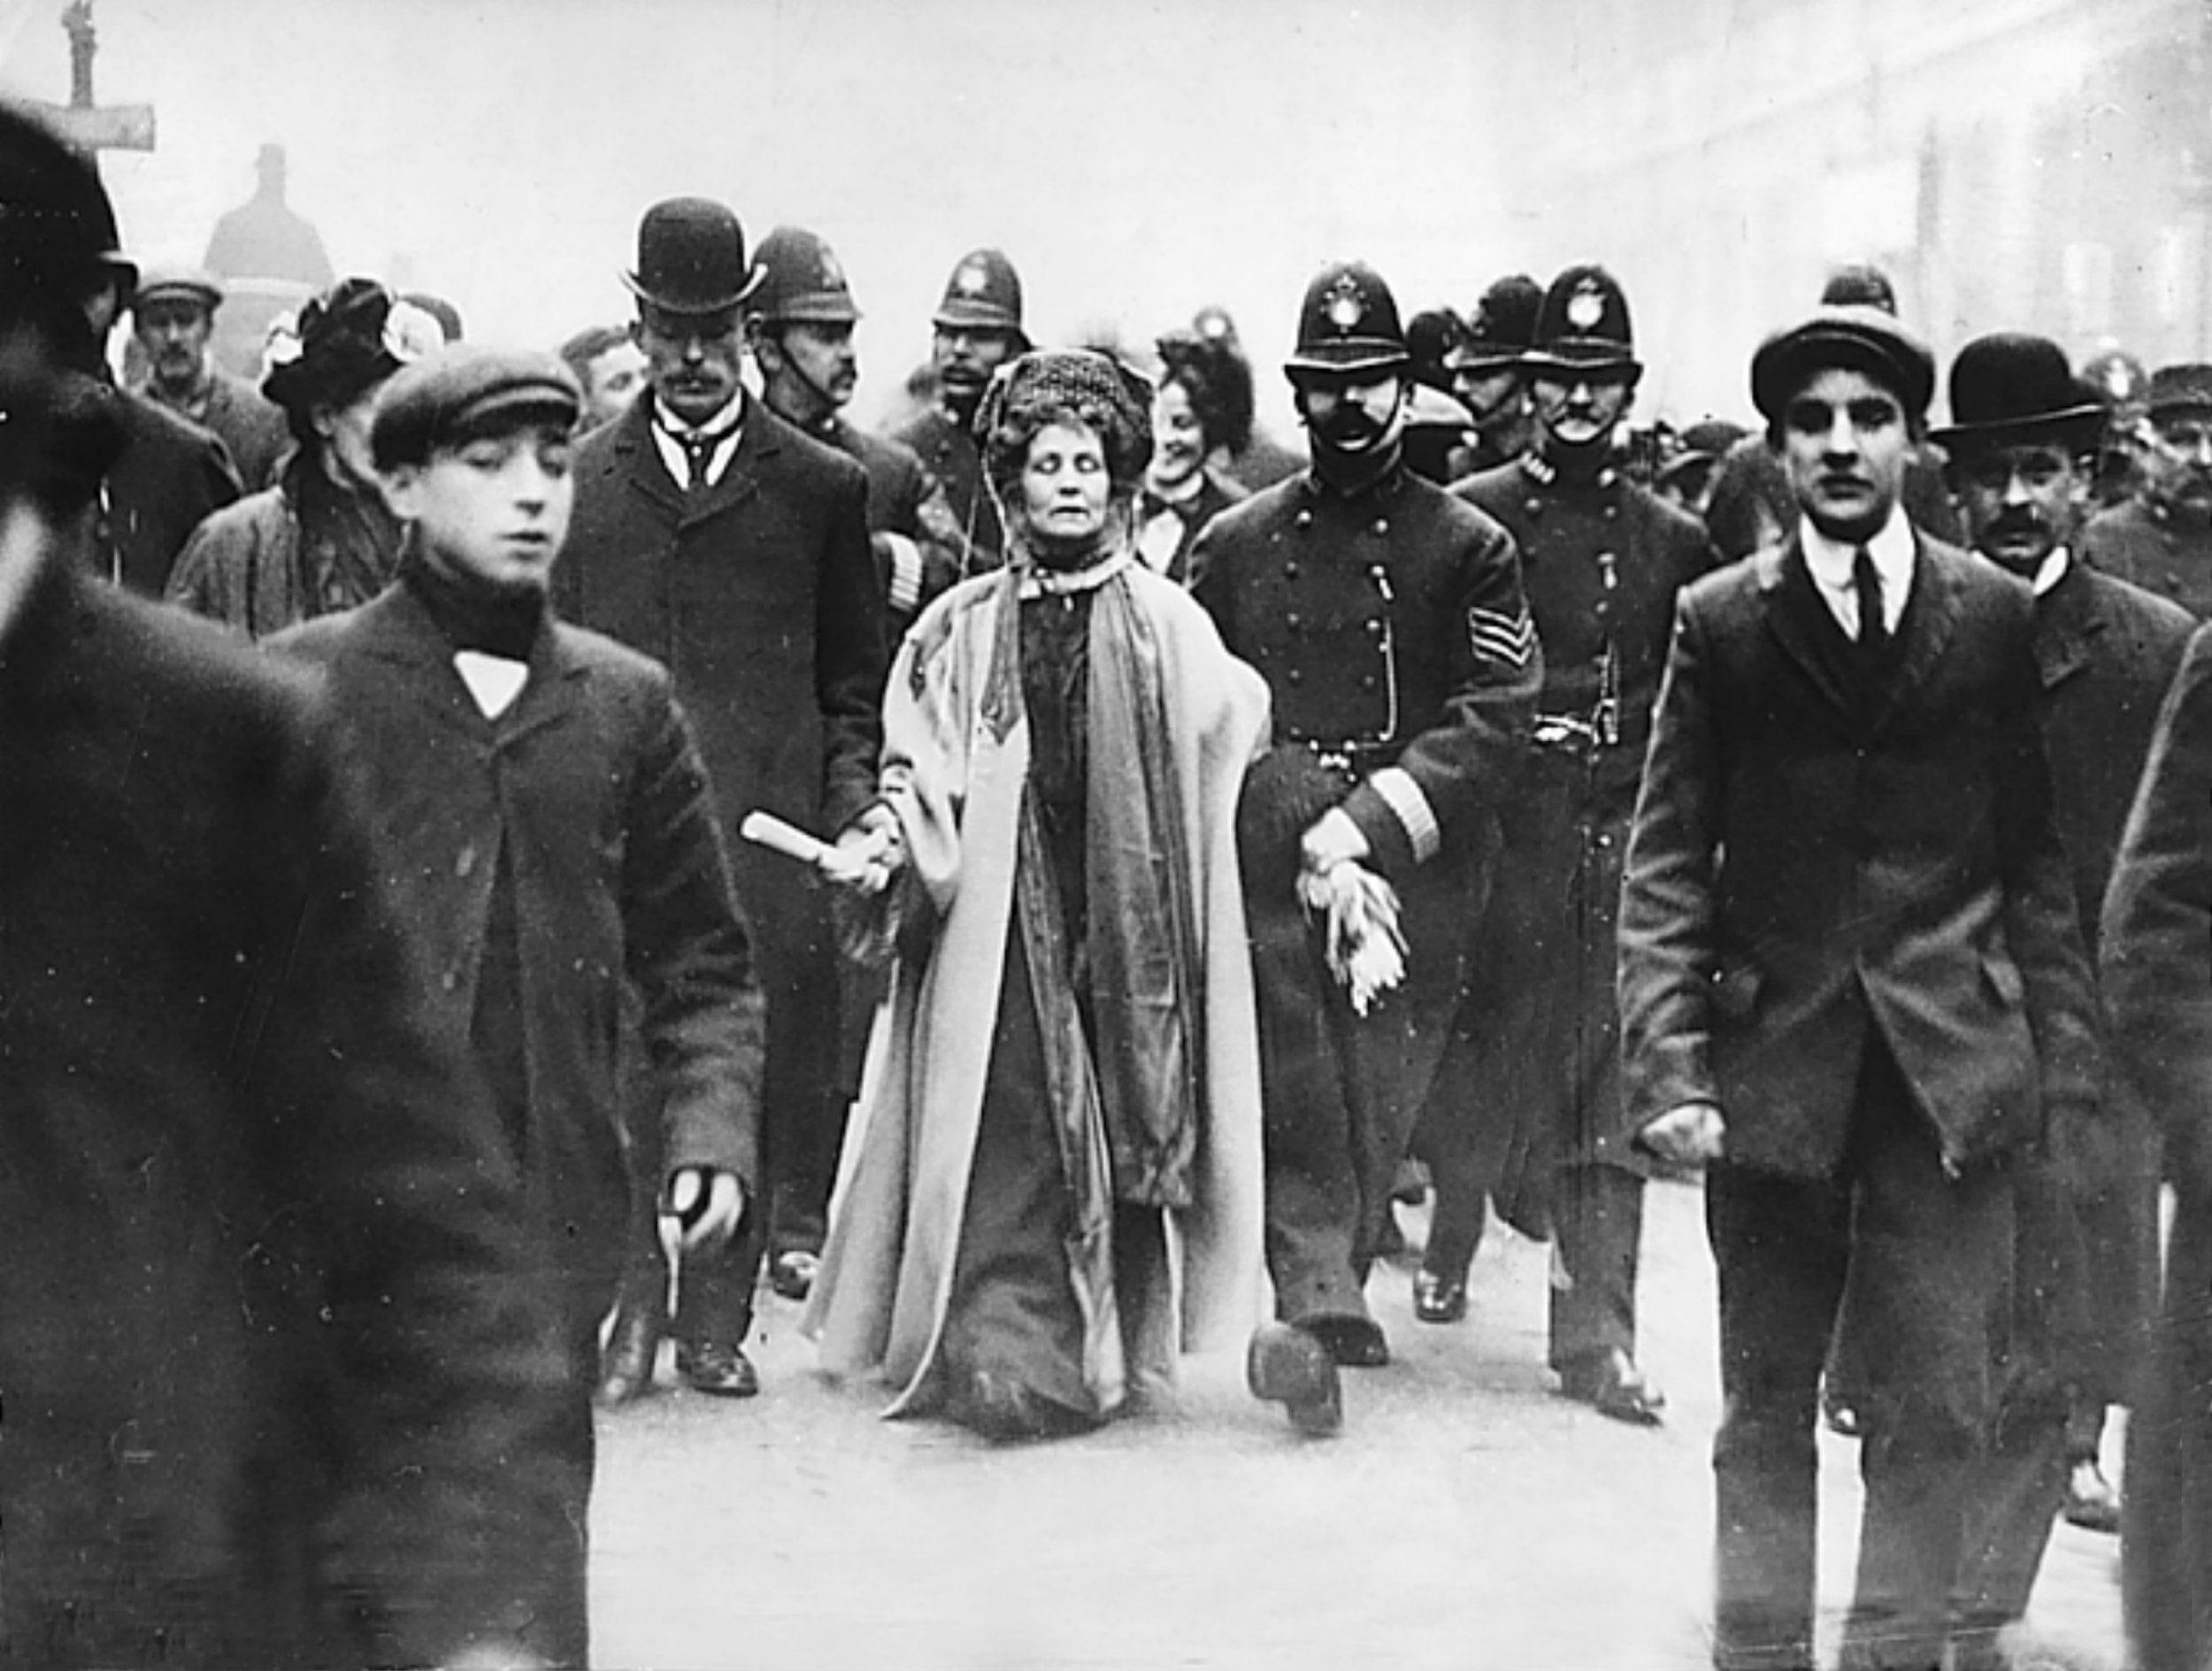 Why Emmeline Pankhurst Would Despise Today's #MeToo Snowflake Feminists.